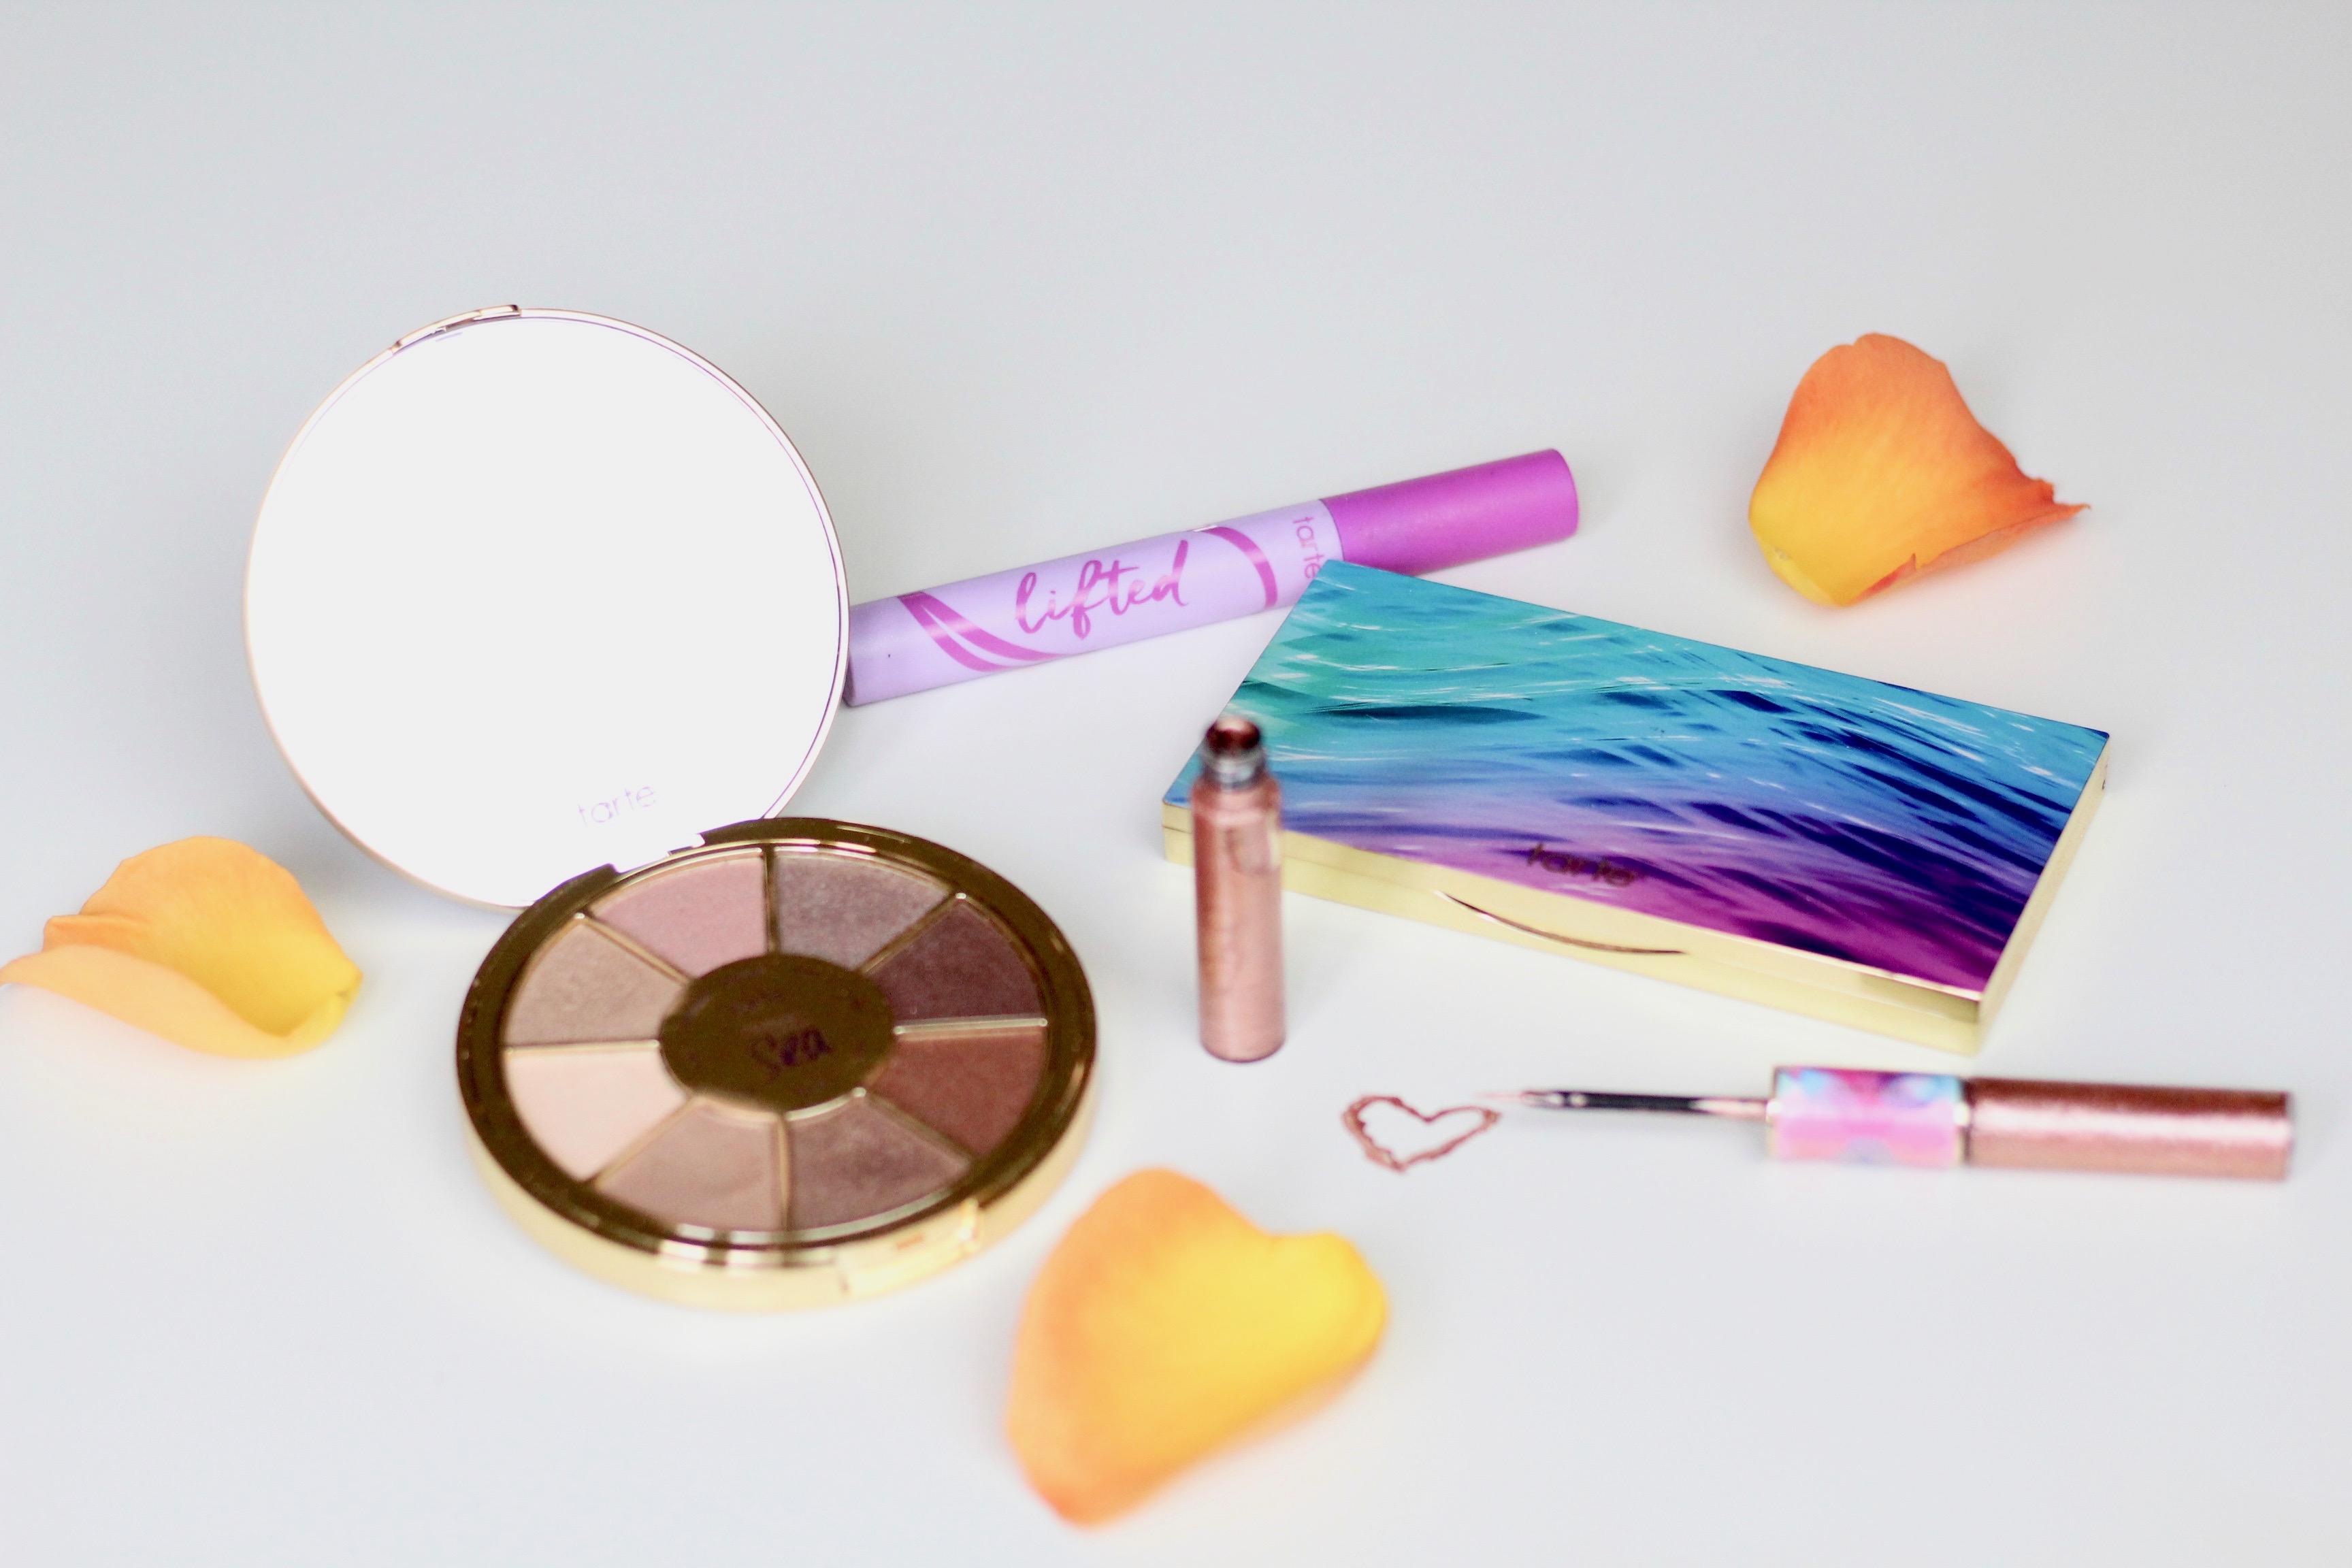 Tarte Cosmetics    Bright Moisturizers, Highlights, Eyeshadow and Lipstick